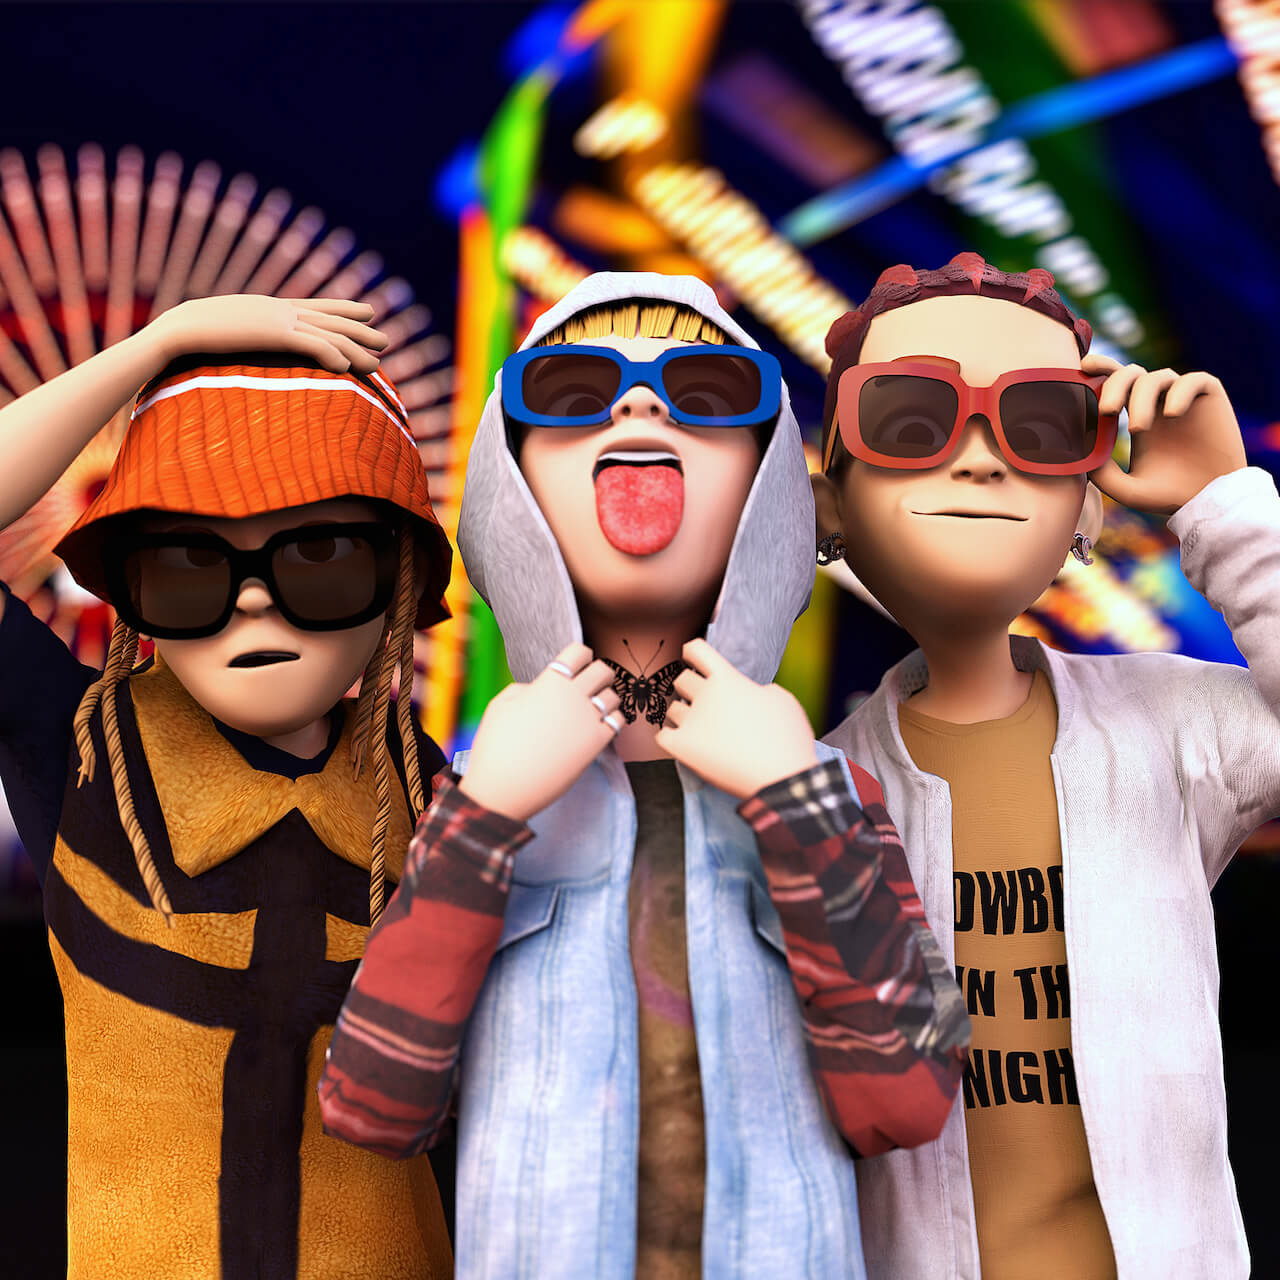 LEX、Only U、Yung sticky womのコラボアルバムからYouTubeリークで話題の「STRANGER」MVが公開 ディレクターは村田実莉 music210729-lex-onlyu-yungstickywom-1